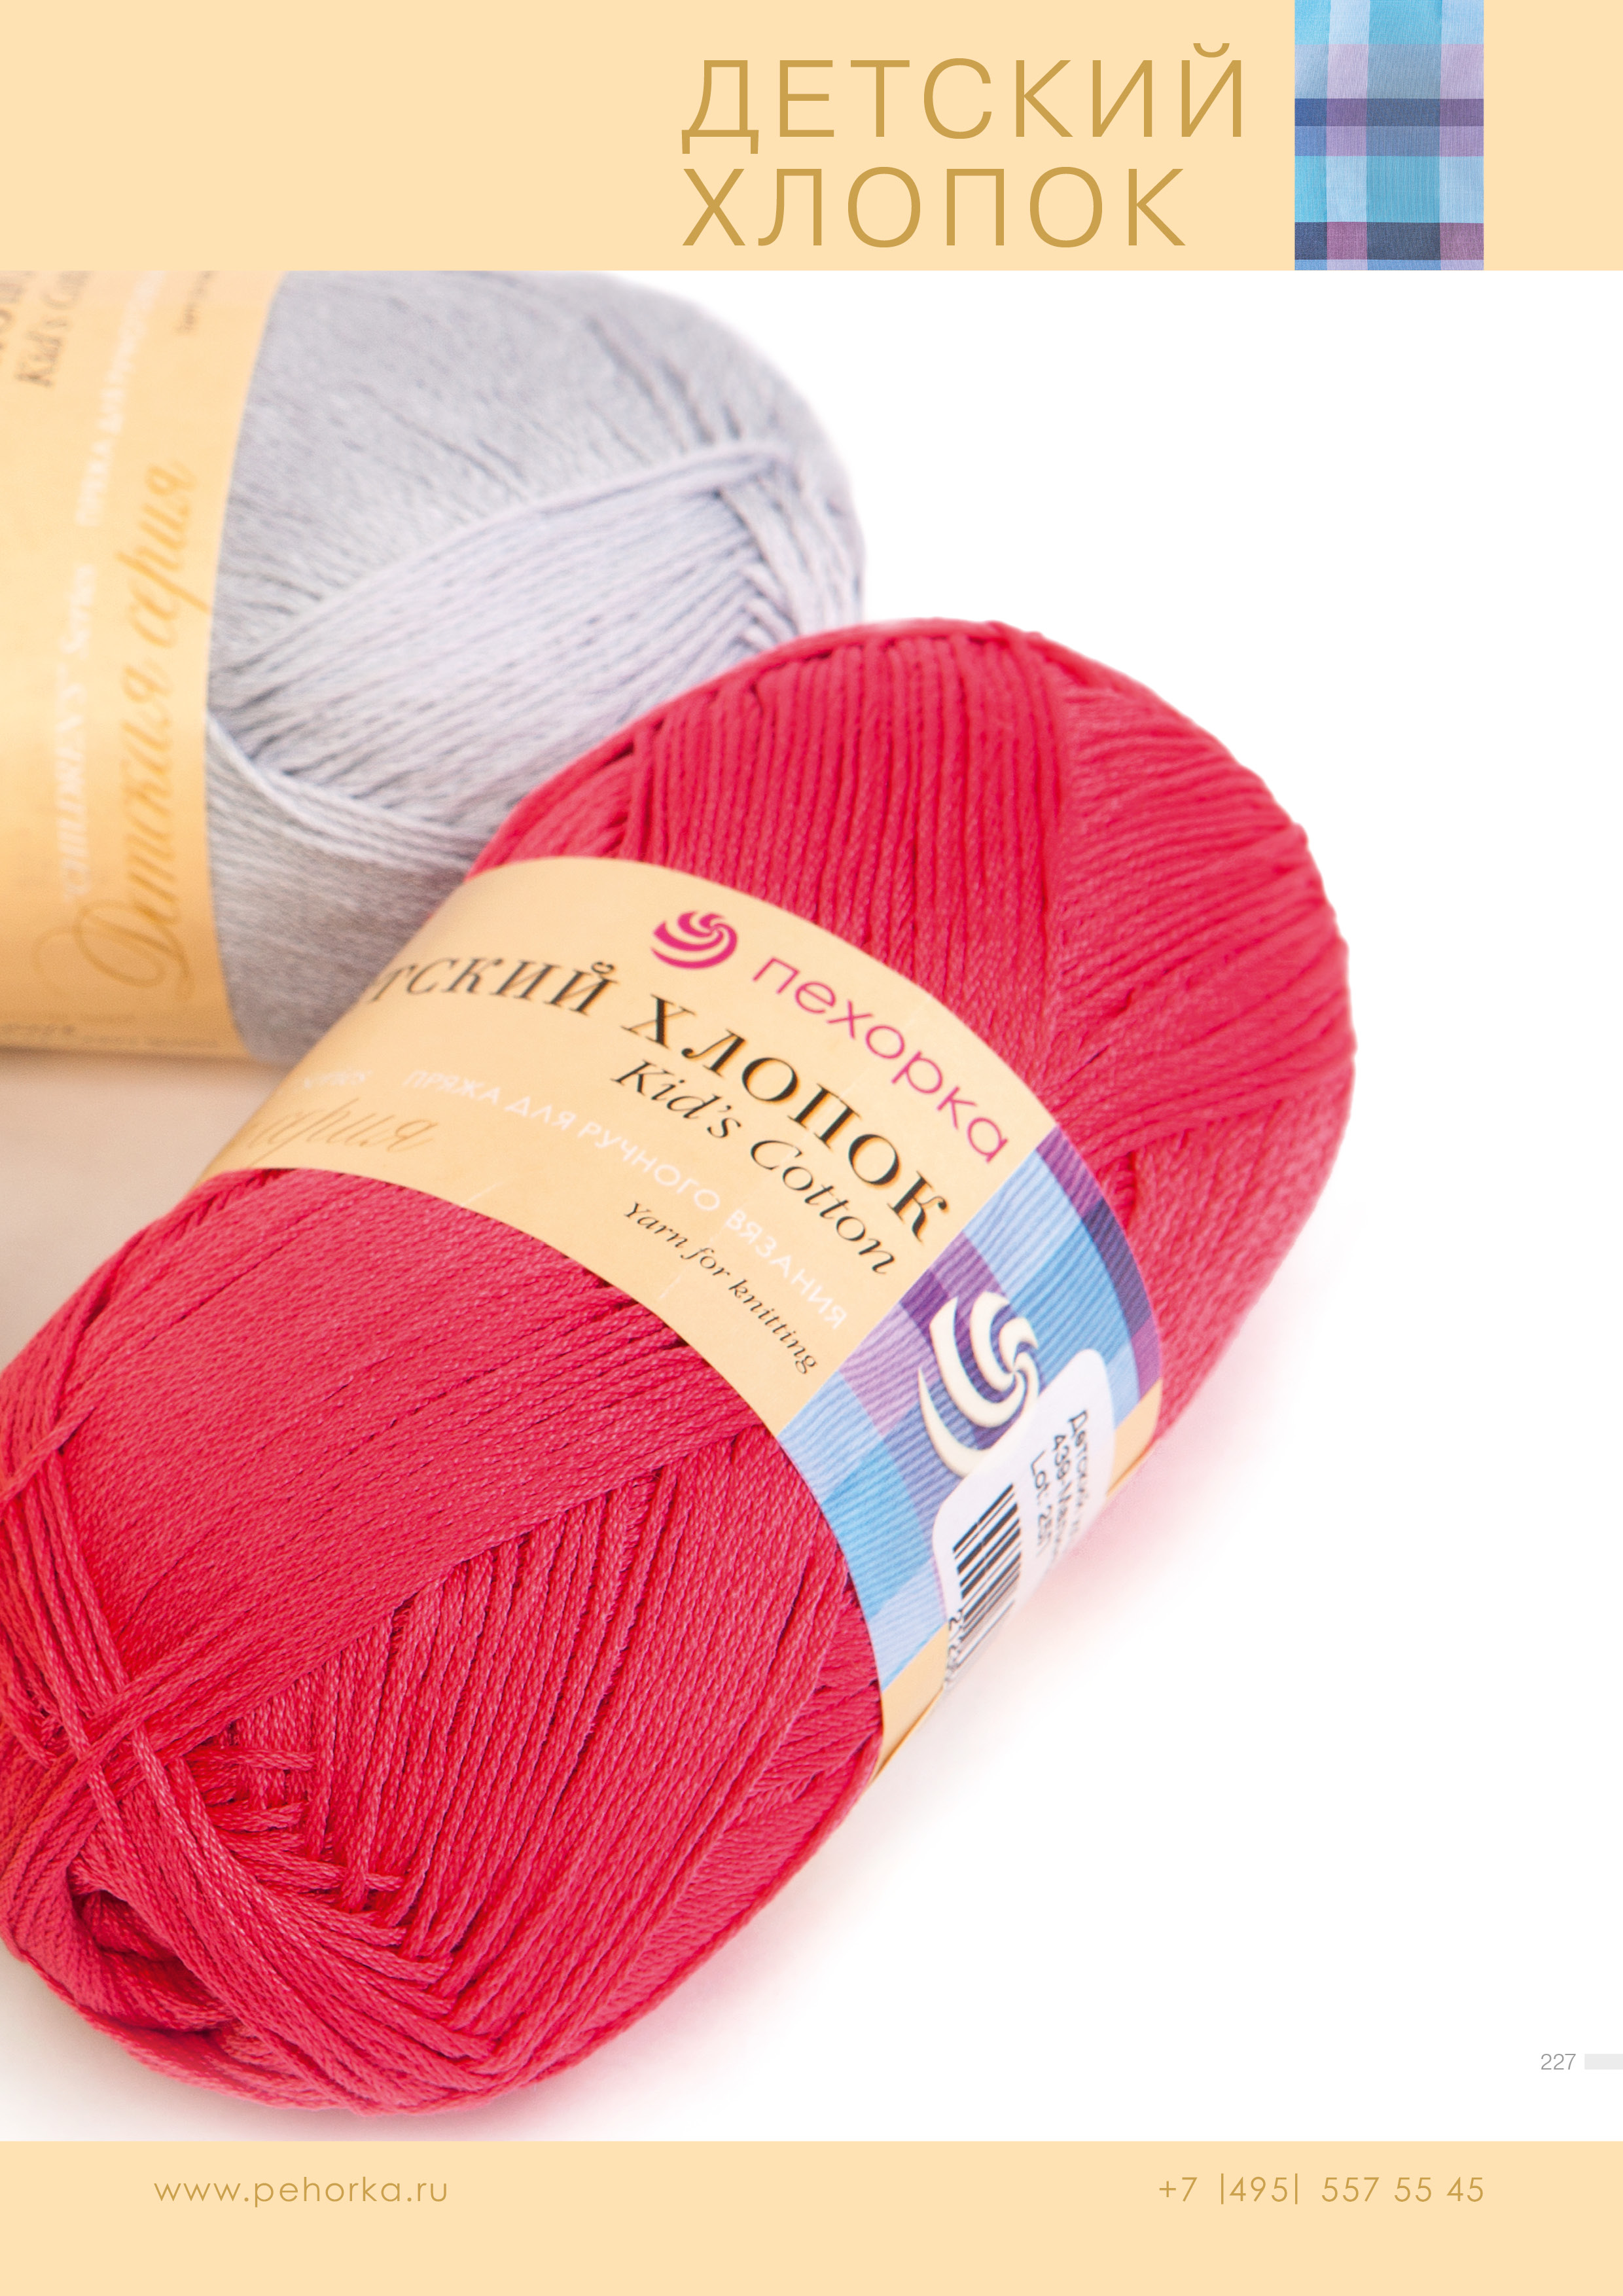 Москва нитки для вязания